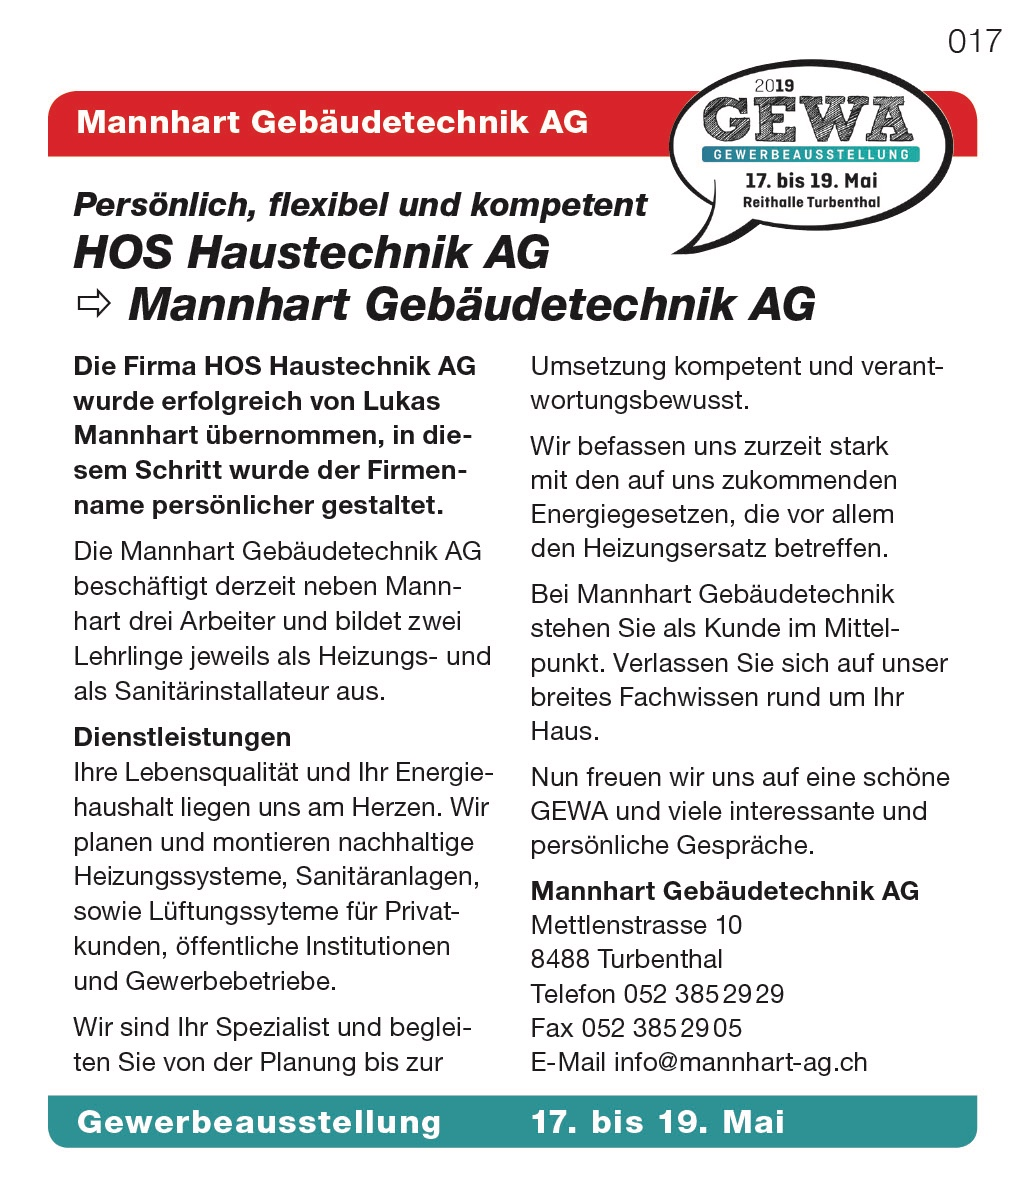 Mannhart Gebäudetechnik AG